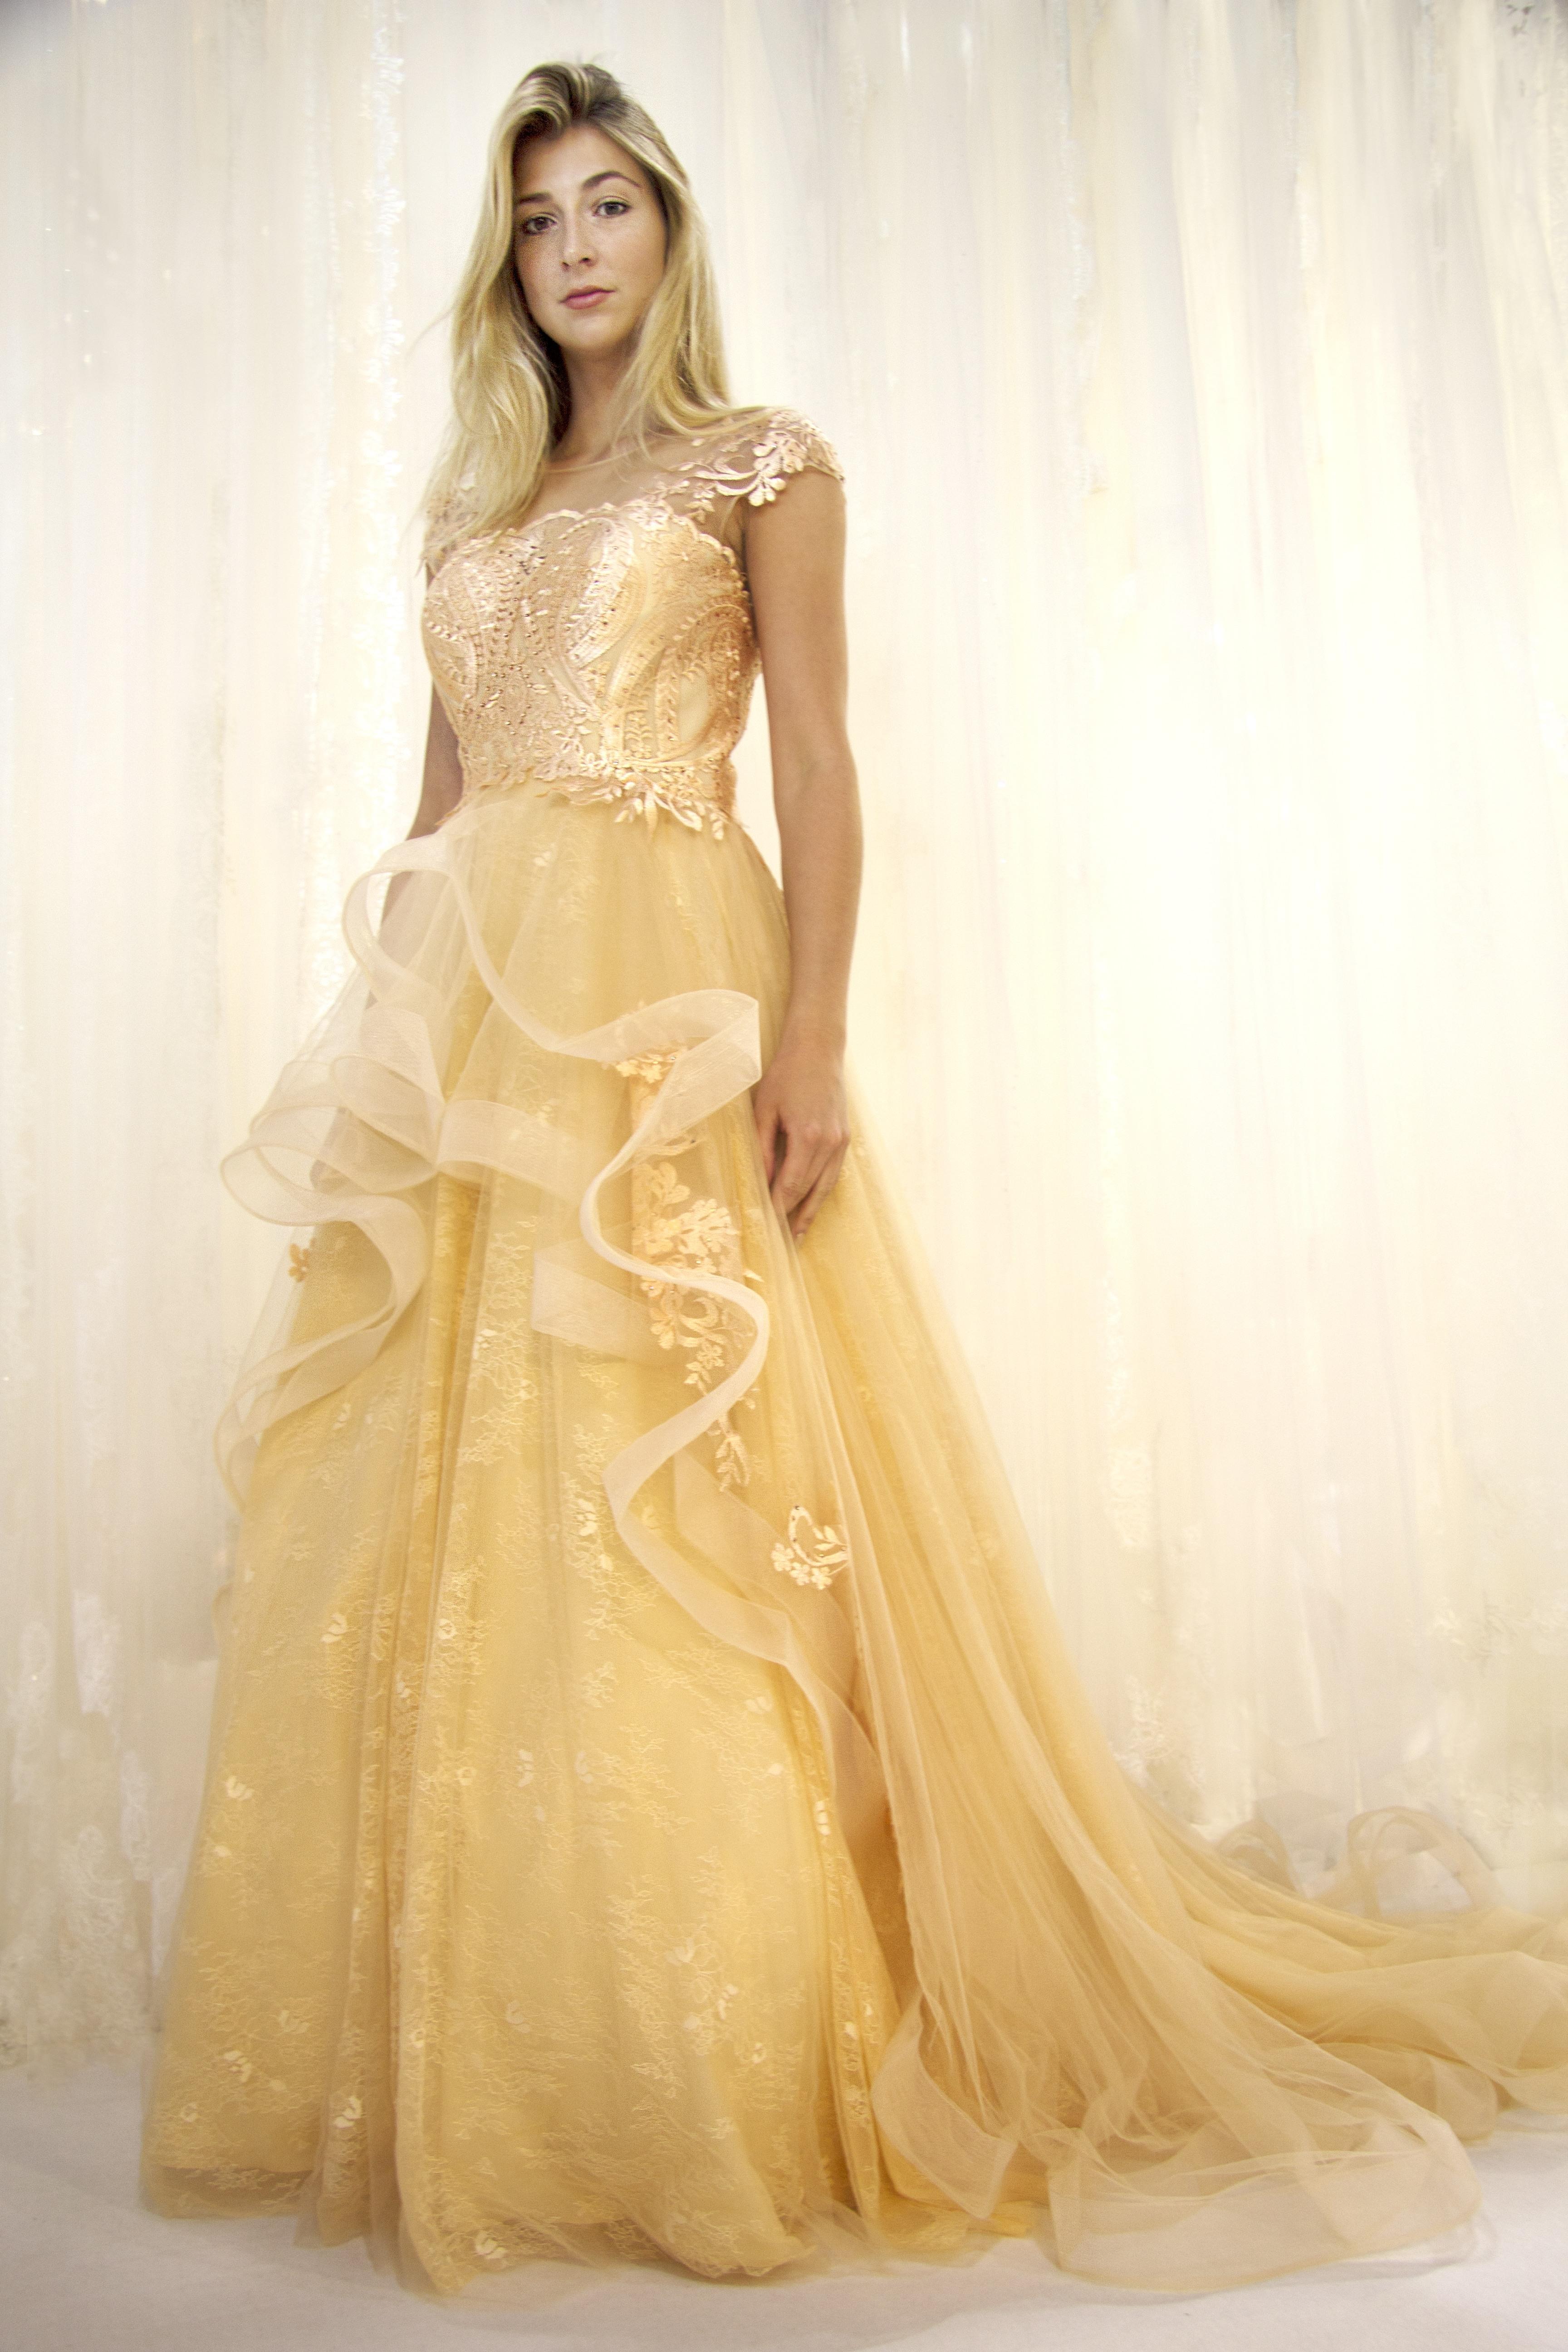 Perfekt Kleider Abiball ÄrmelAbend Kreativ Kleider Abiball Galerie